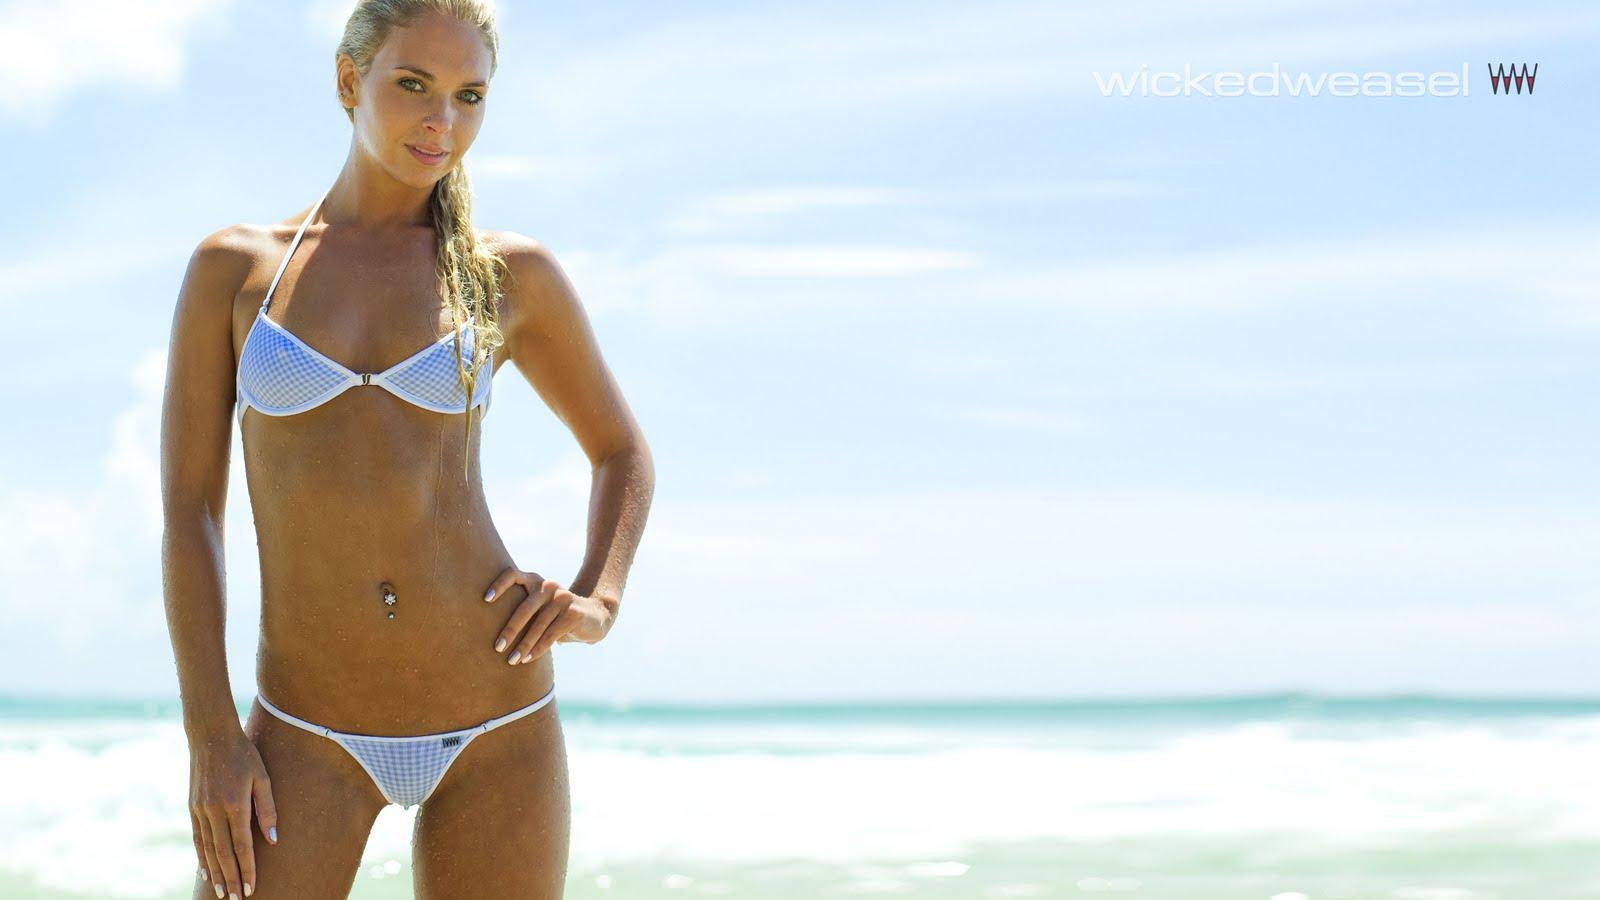 where can i get bikini girls wallpaper